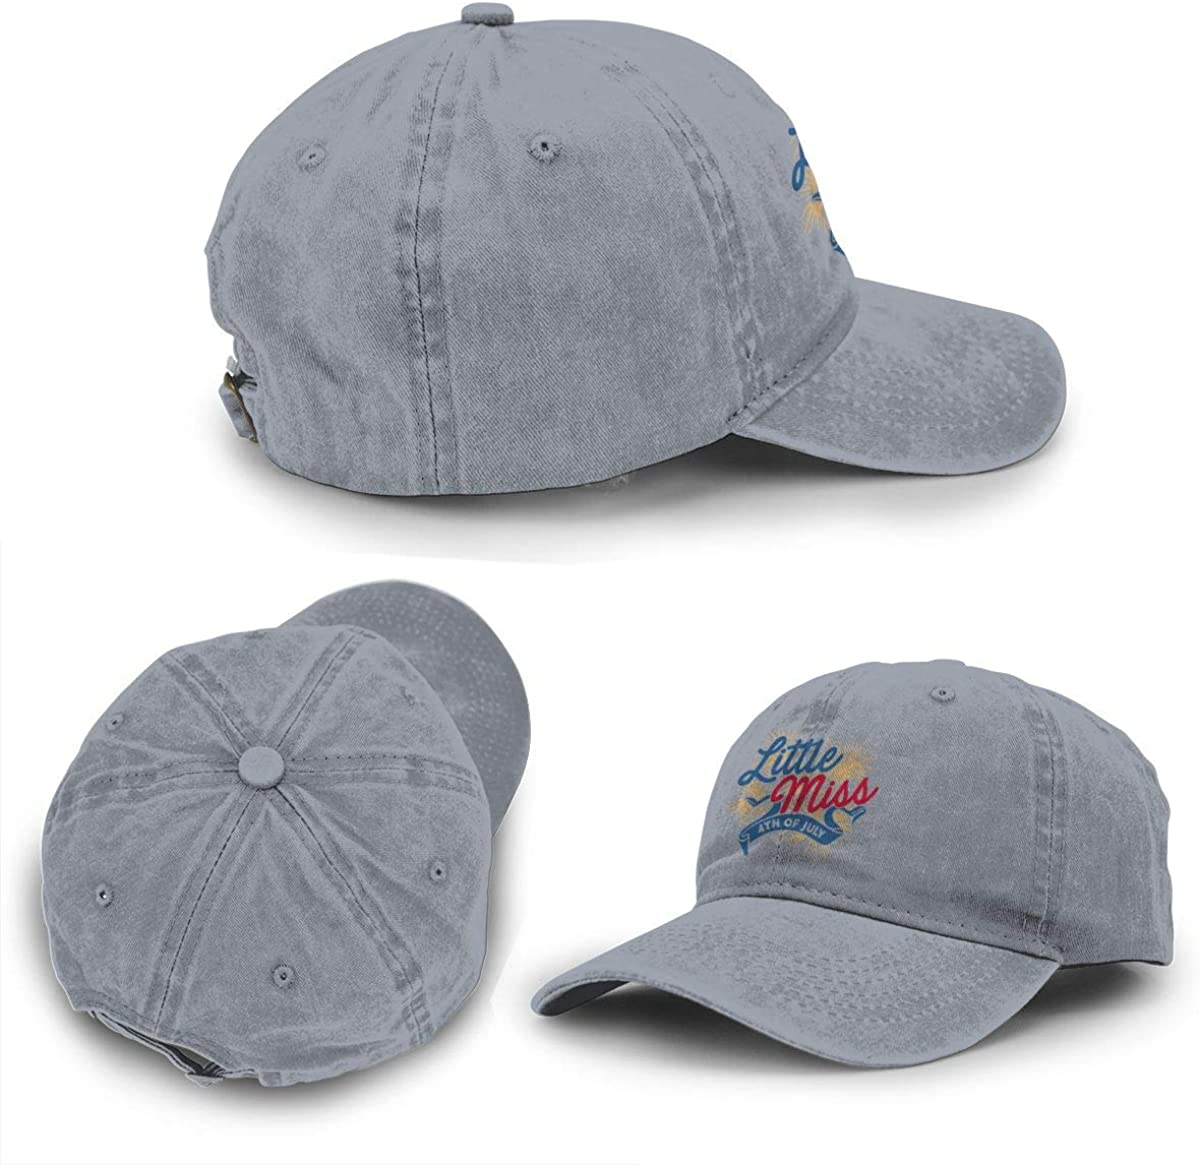 Little Miss 4th of July Unisex Adjustable Baseball Cap Cowboy Hat Sports Trucker Hat